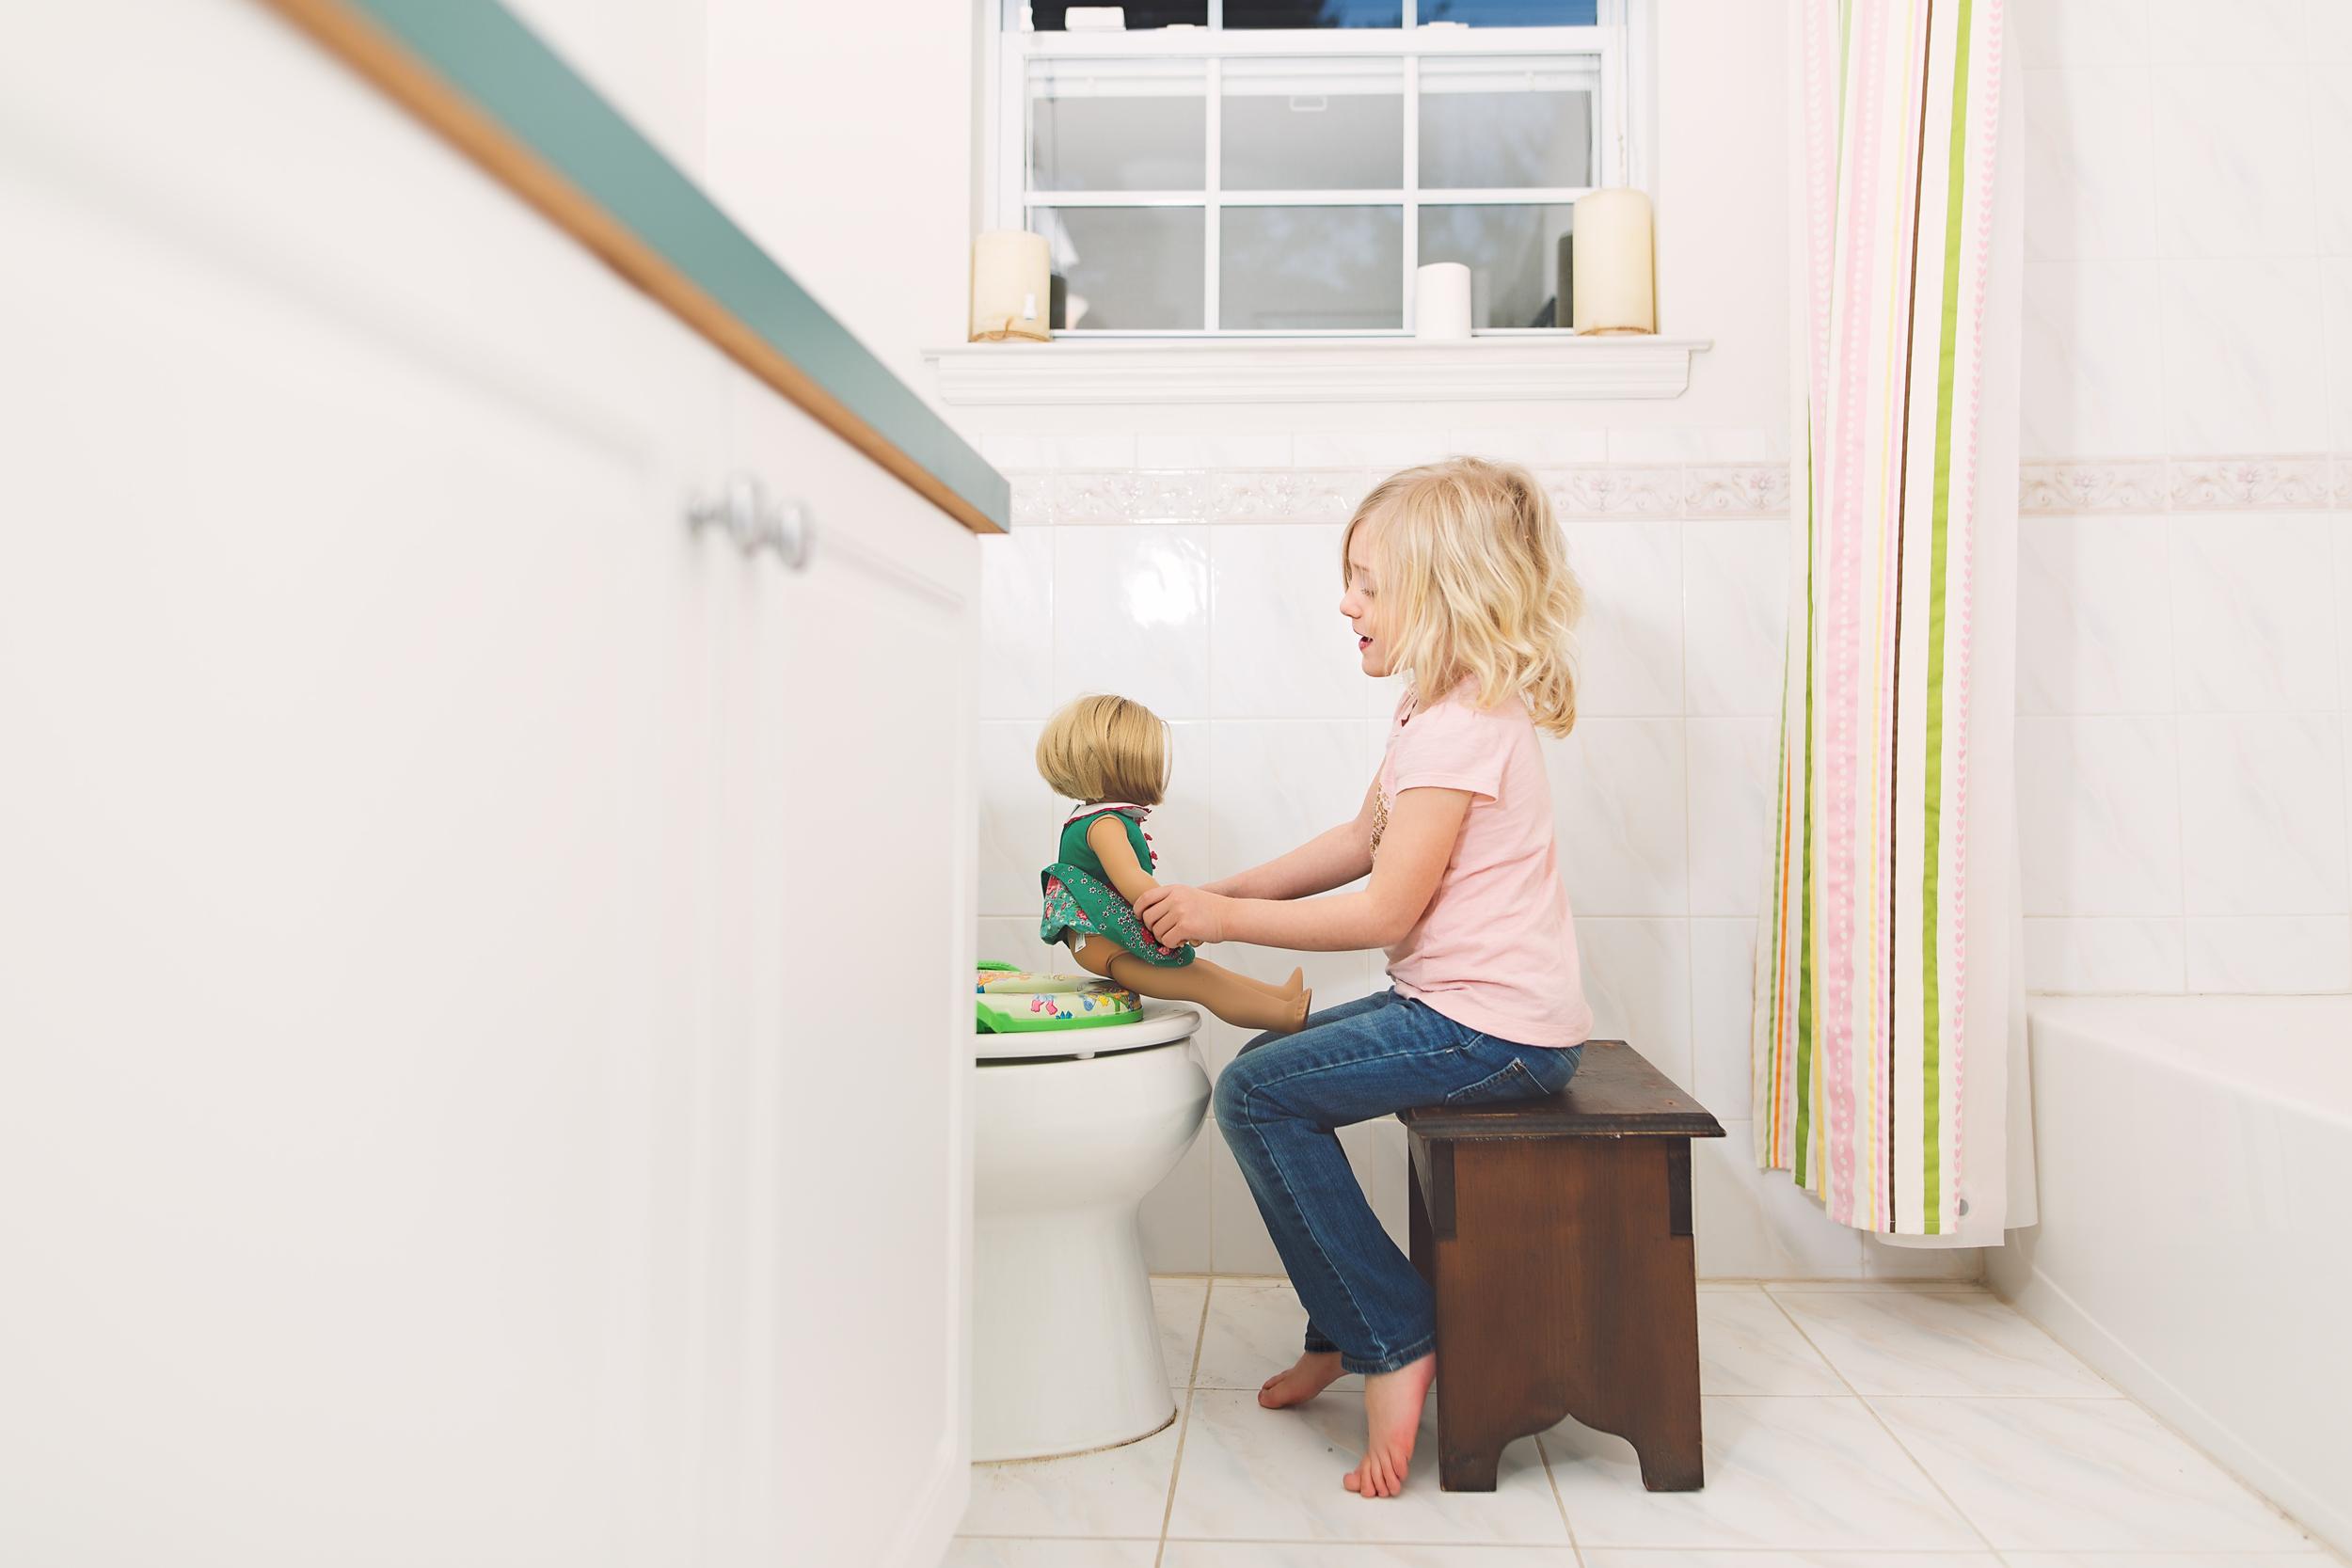 Hello-olivia-photographer-long-island-family-portrait-photographer-potty-training